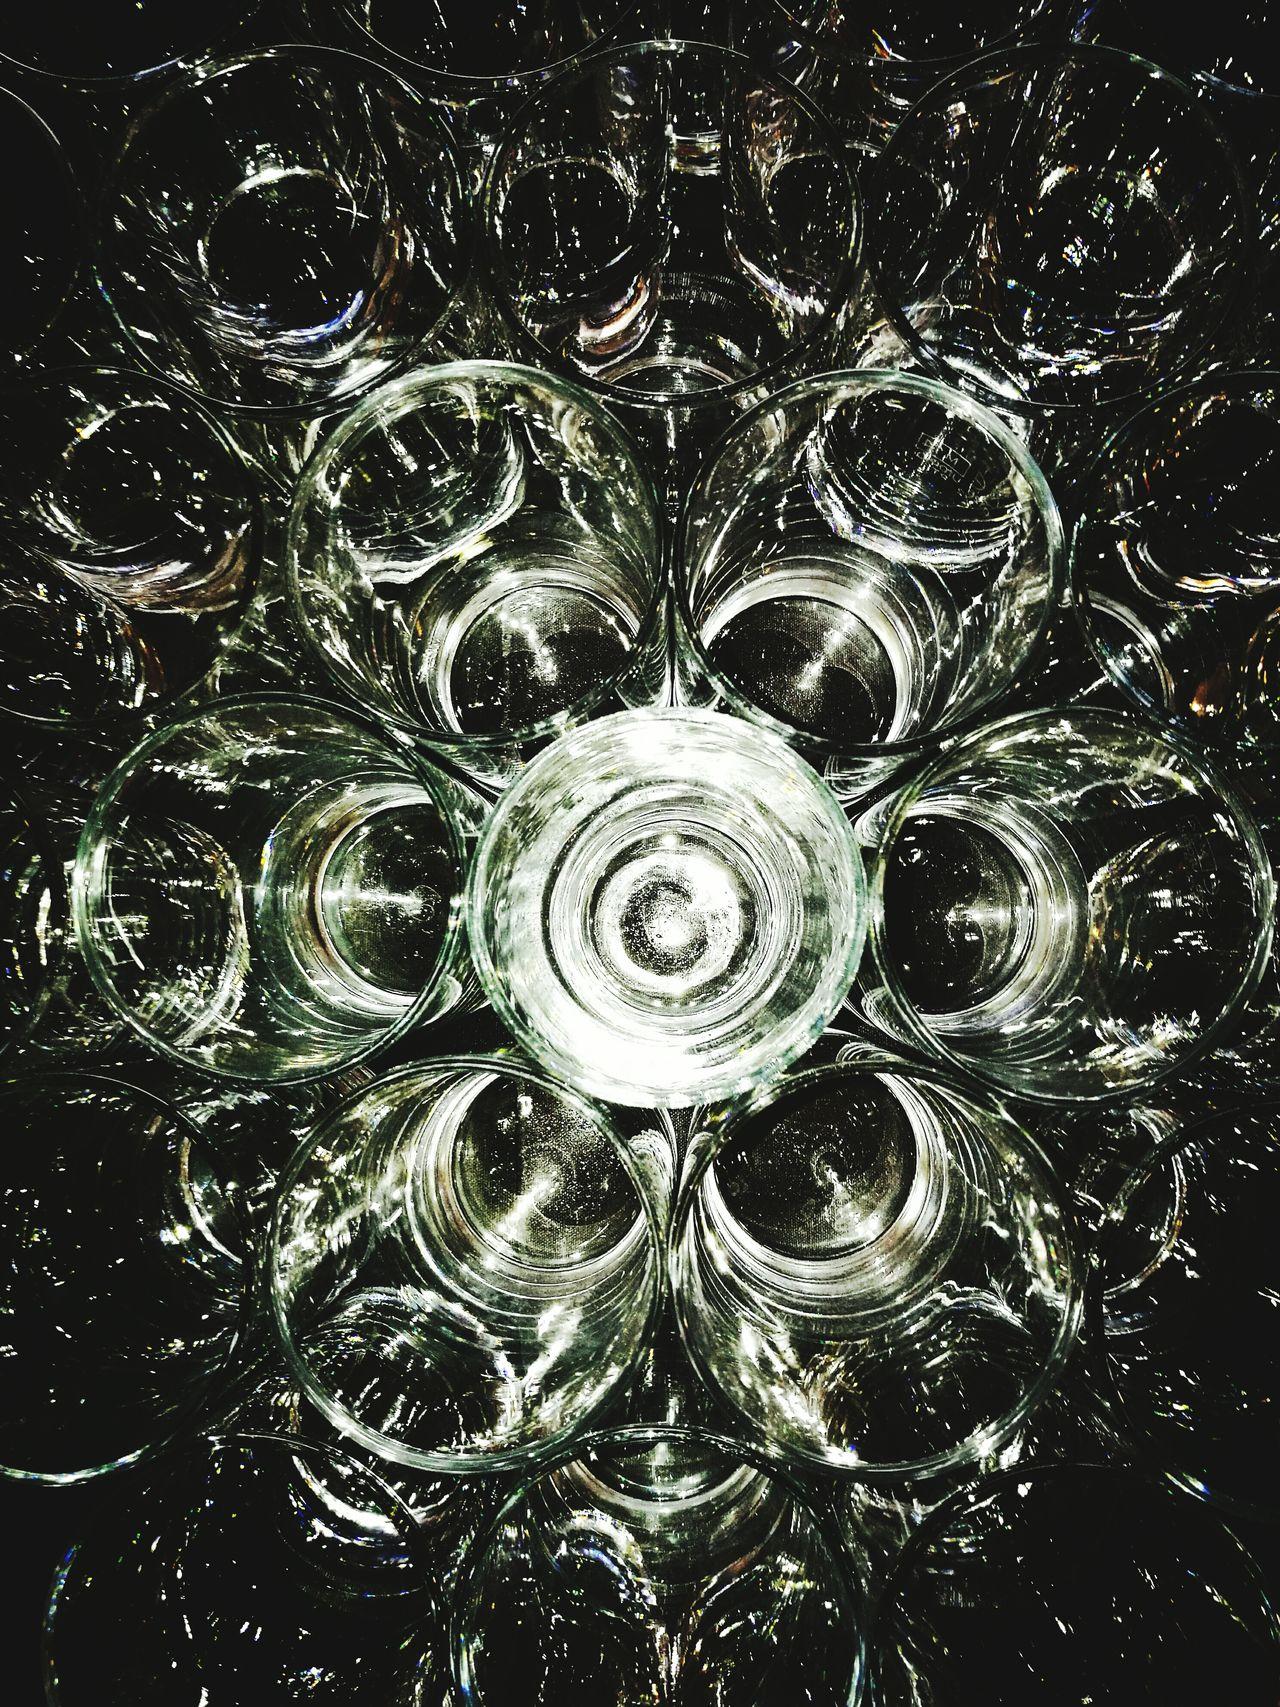 Glasses Reflect Illuminated Drink Cheers celebration